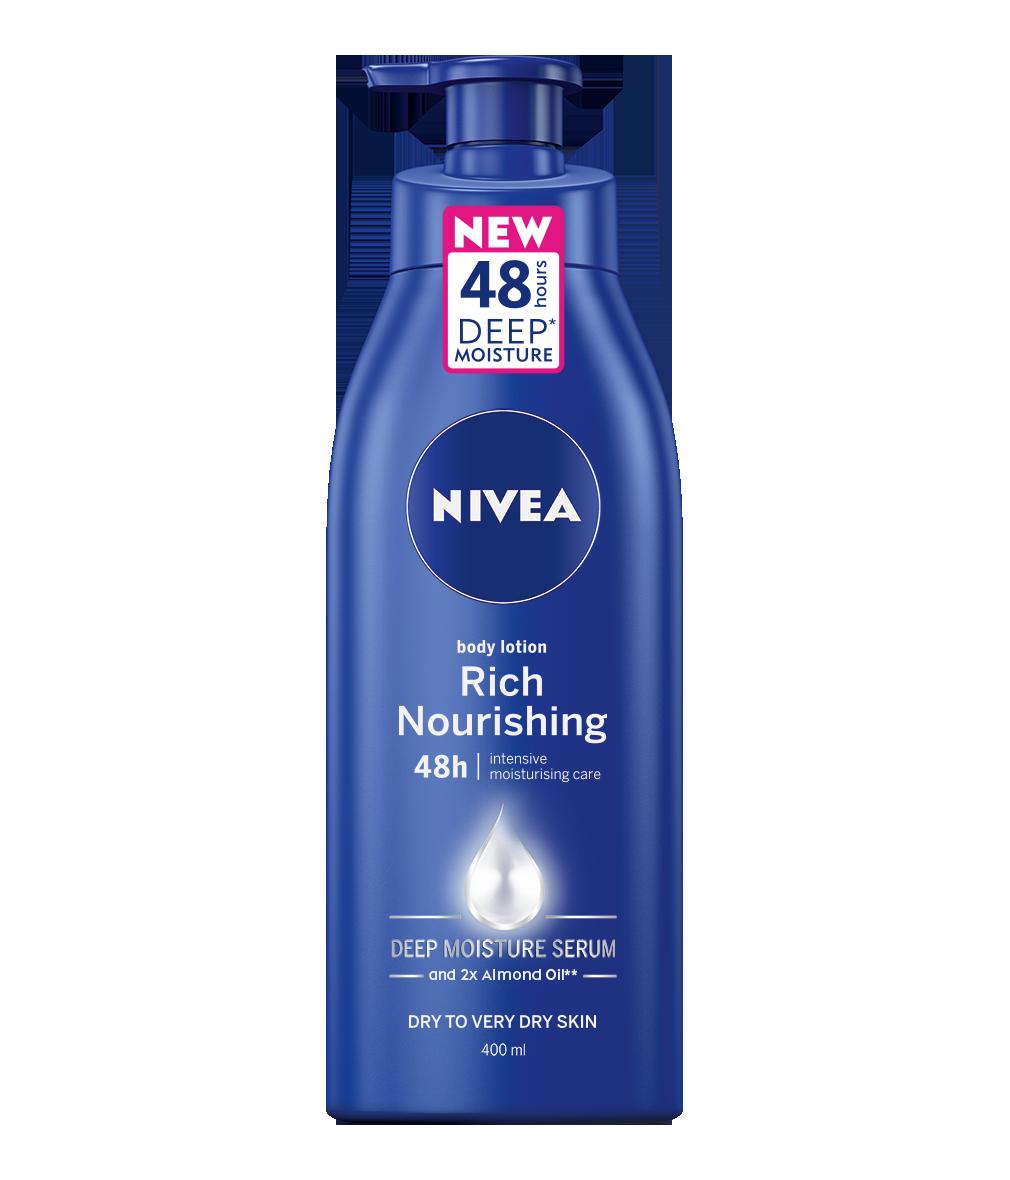 NIVEA Rich Nourishing Body Lotion